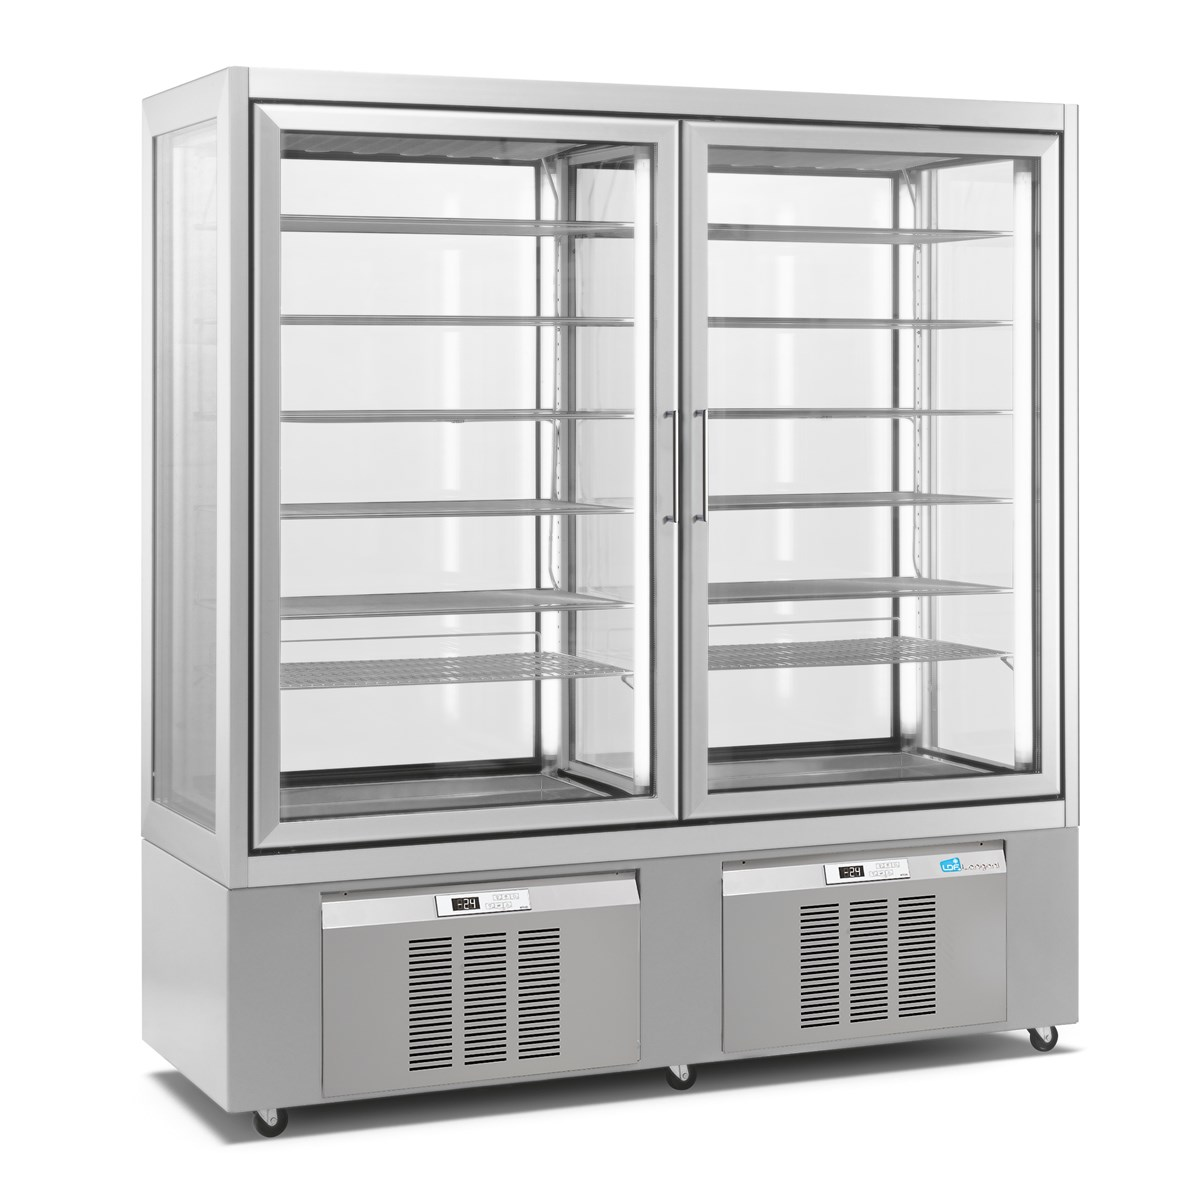 9124-classica-gelateria